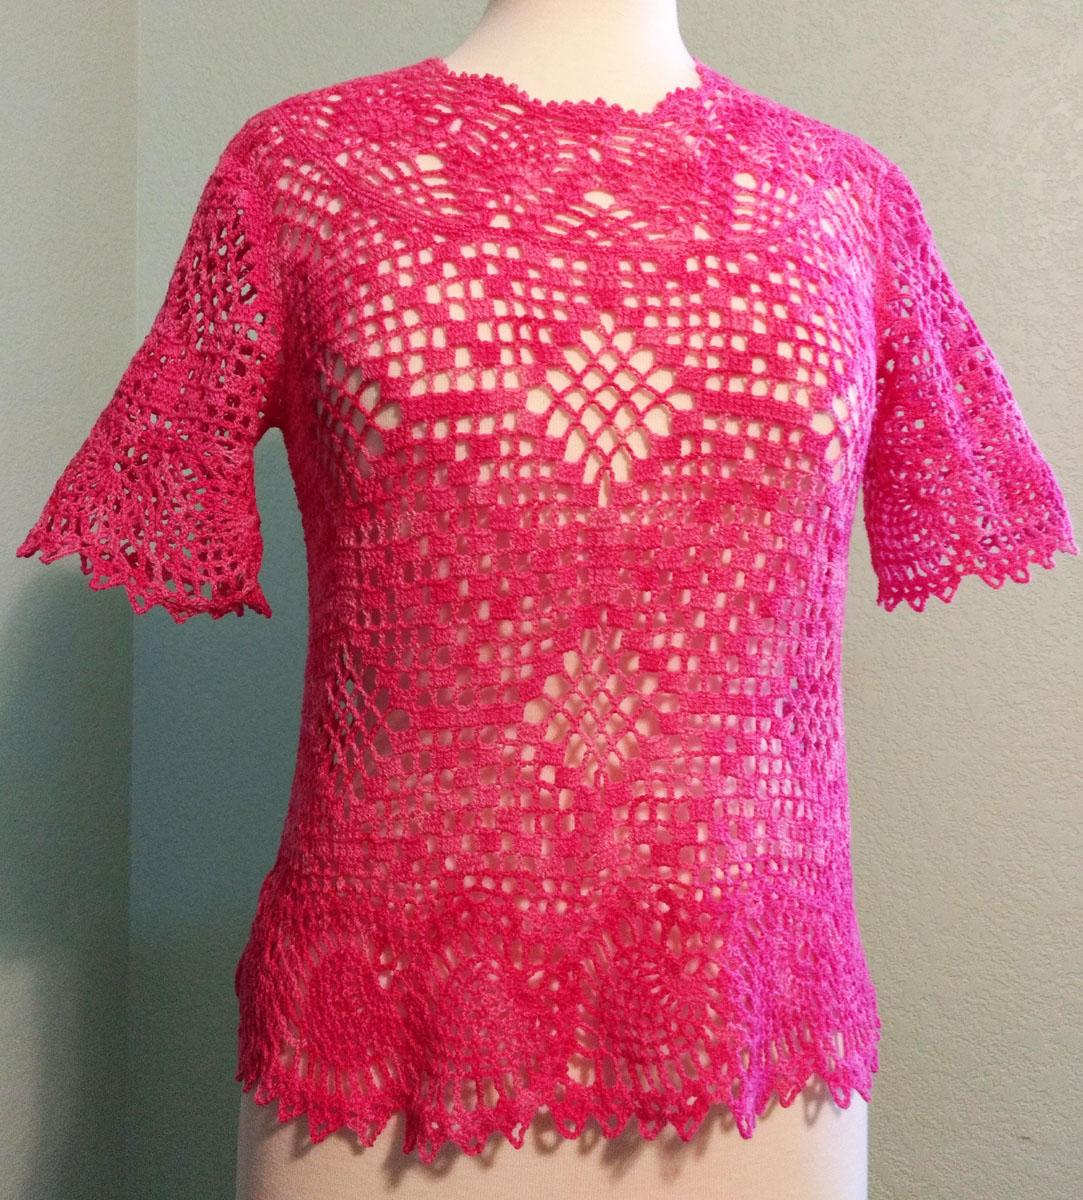 Crochet Diagram Crochetting Patterns Pinterest